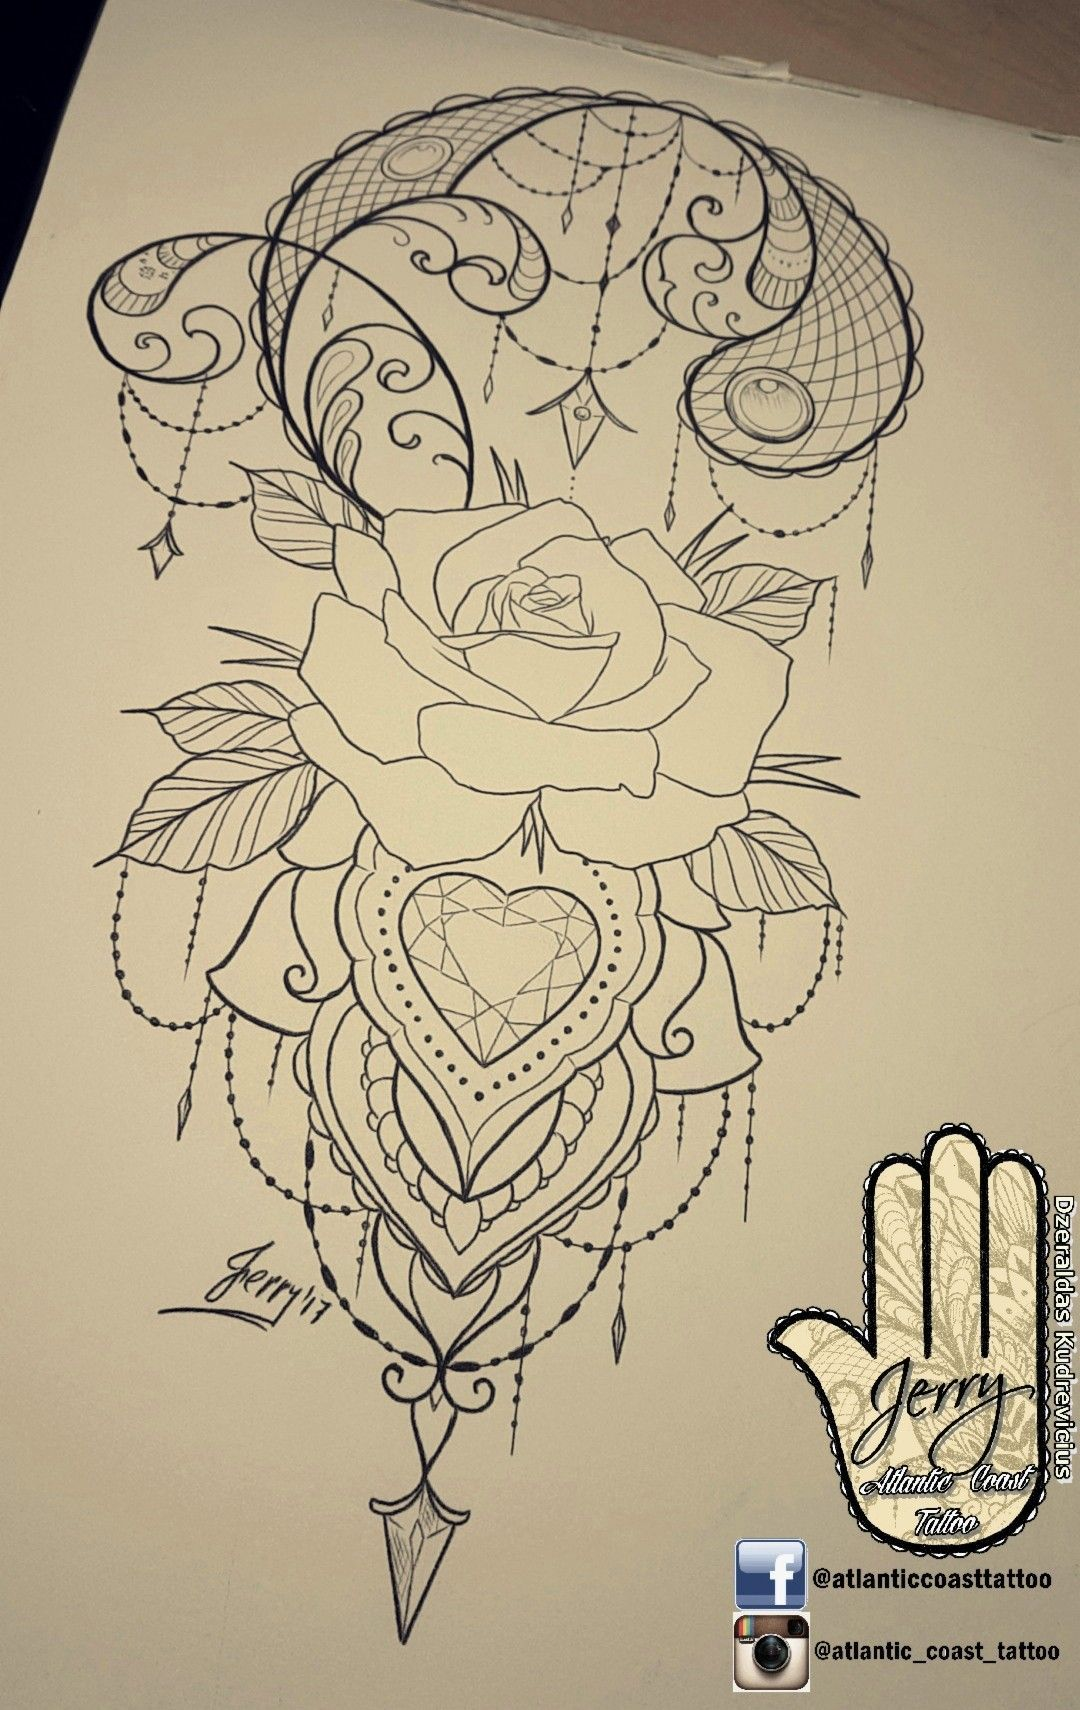 8d7d9114c Beautiful tattoo idea design for a thigh arm by dzeraldas jerry kudrevicius  from Atlantic Coast tattoo